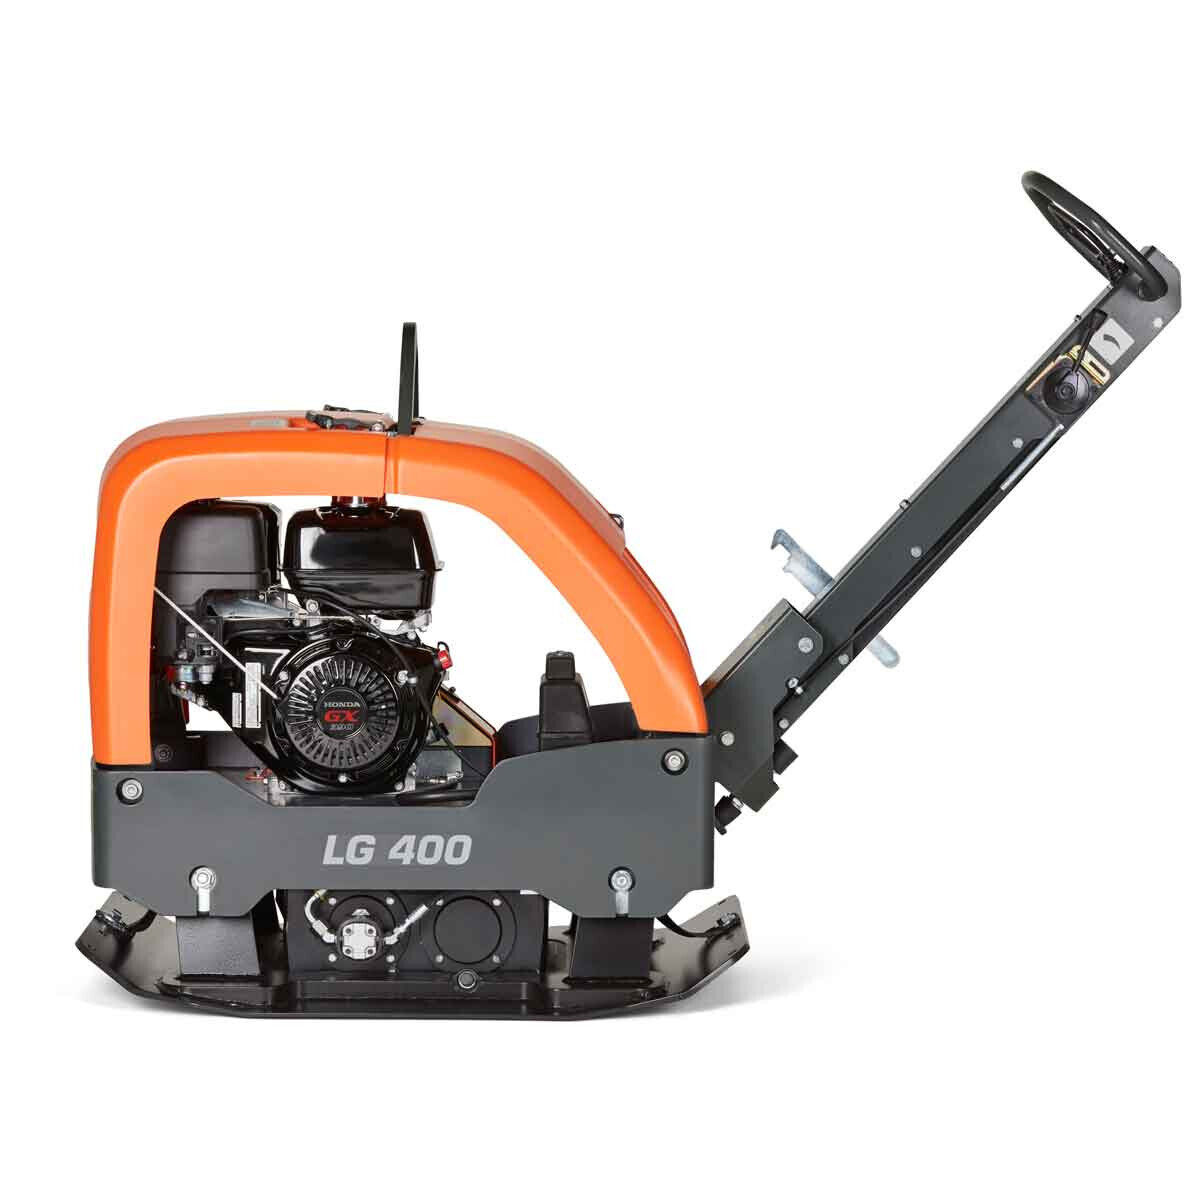 Husqvarna LG 400 Gas Powered Plate Compactor